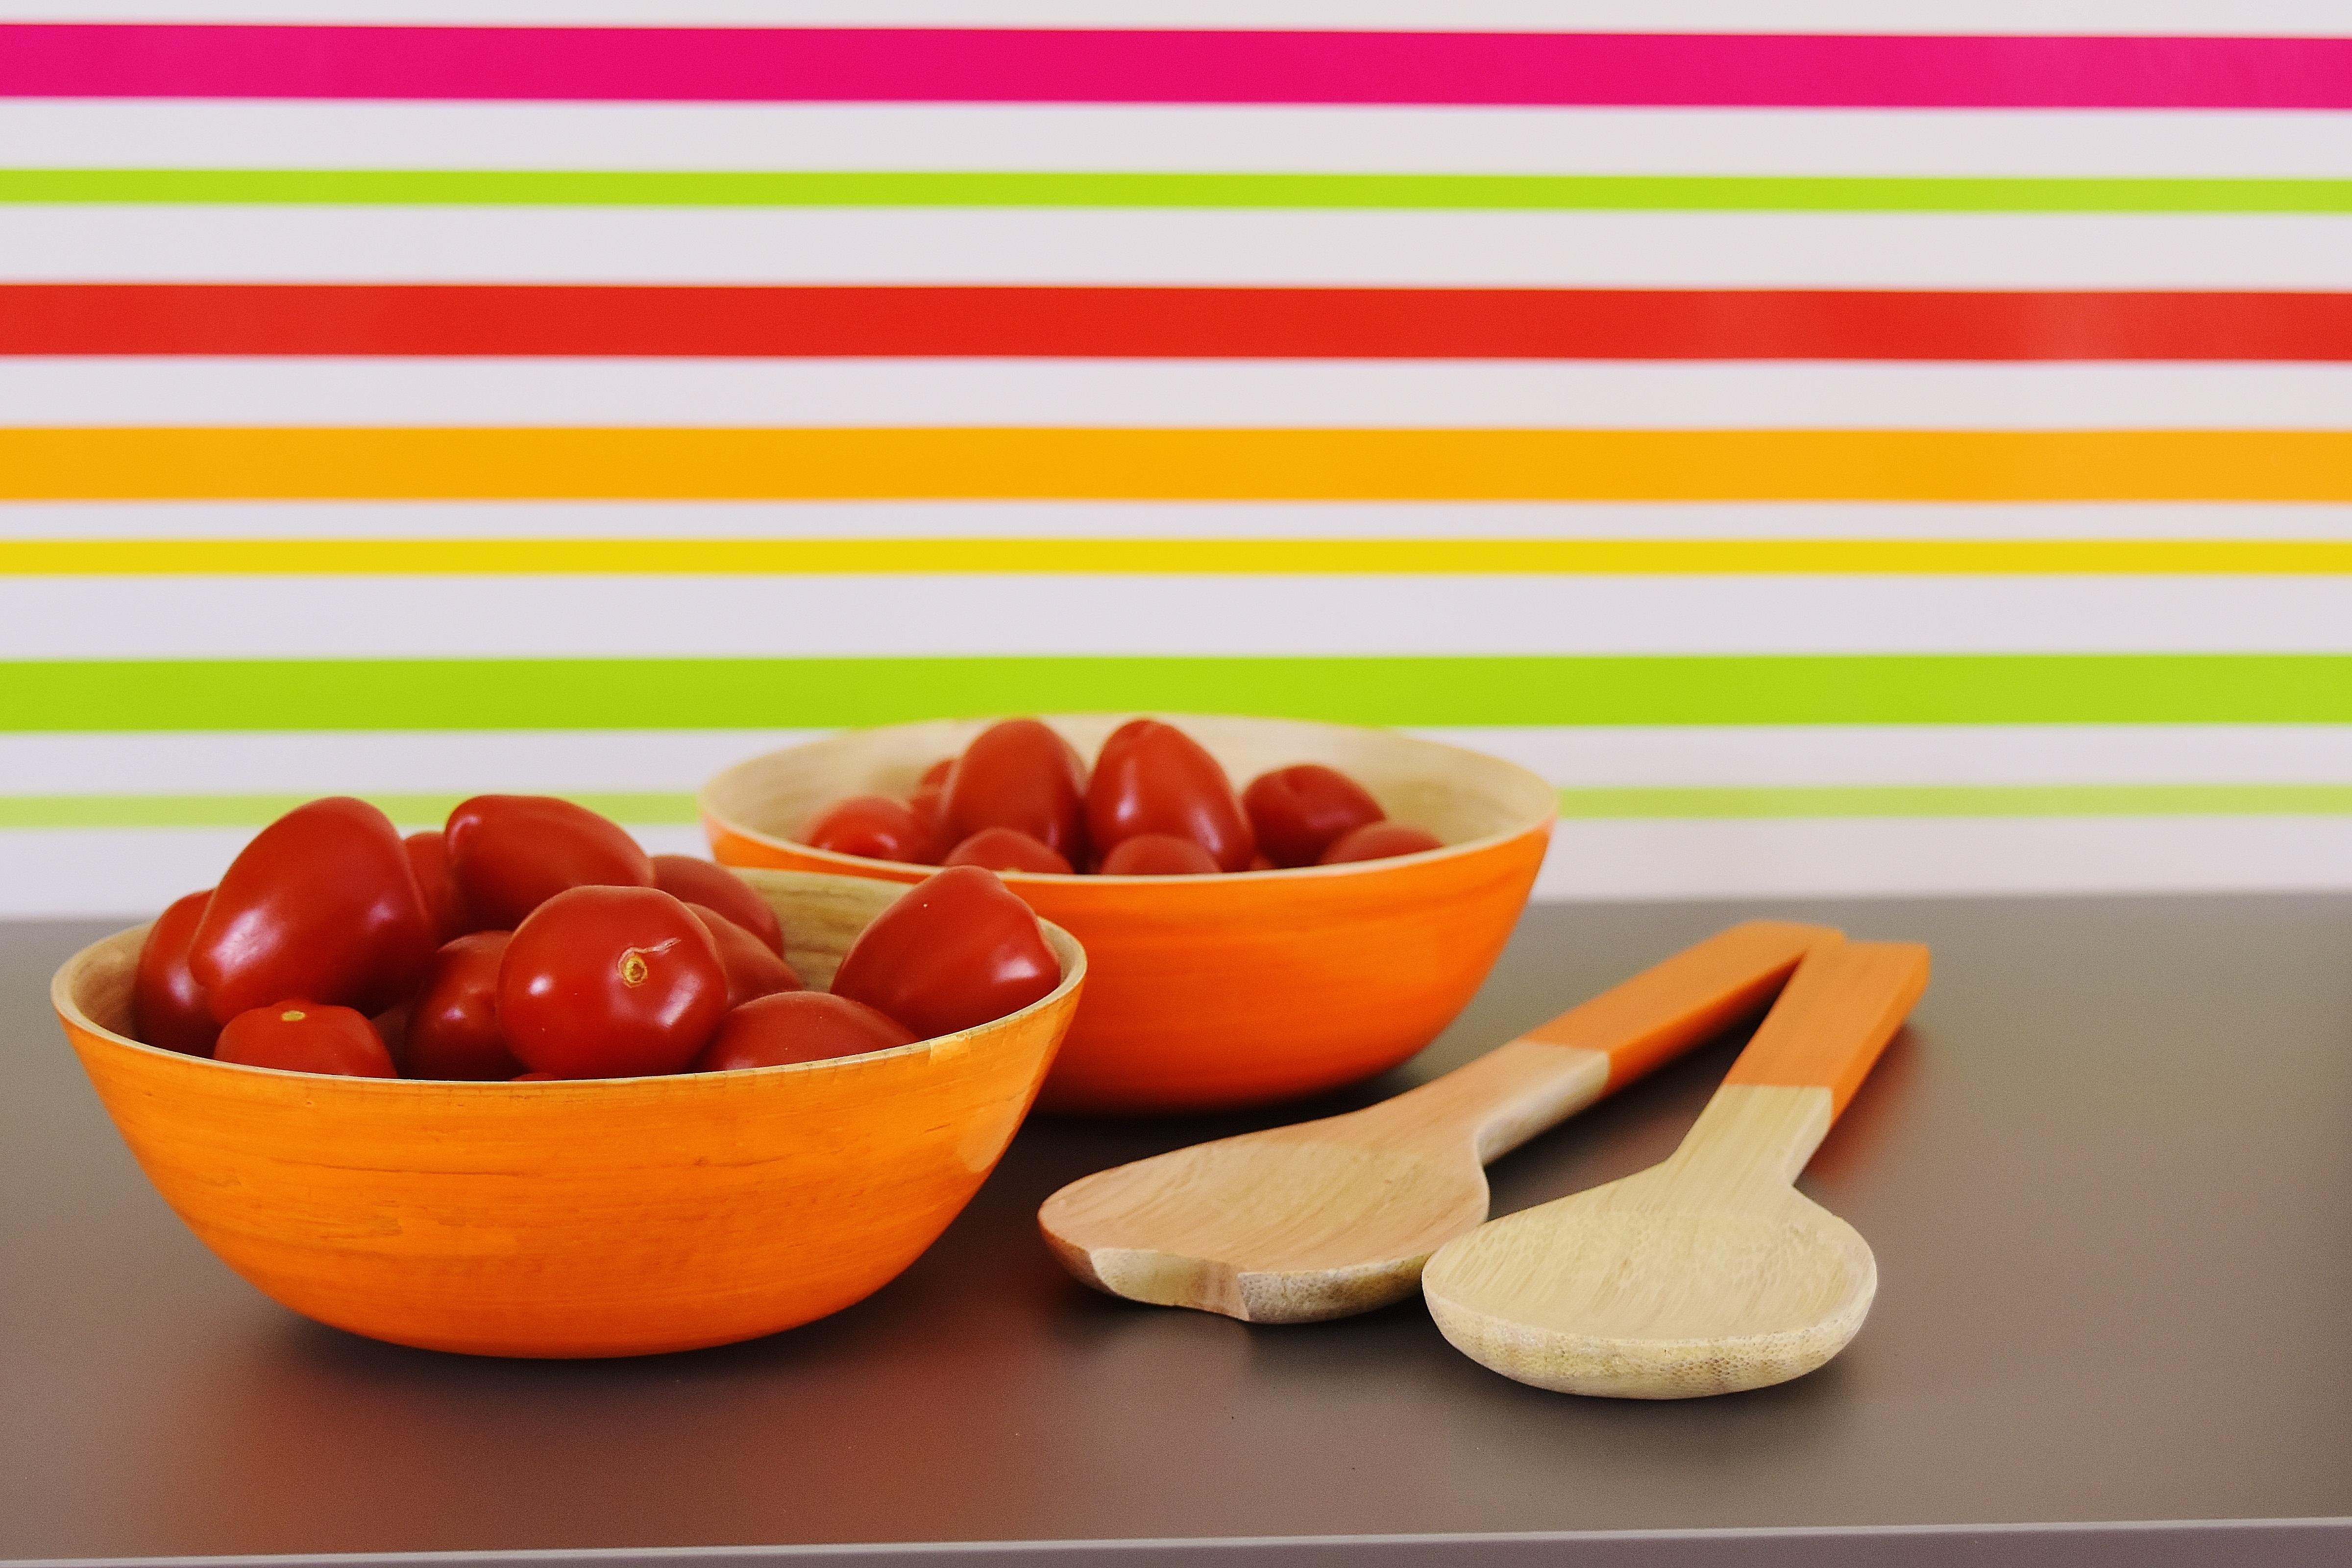 fotos fruta comida produce vegetal saludable pintura